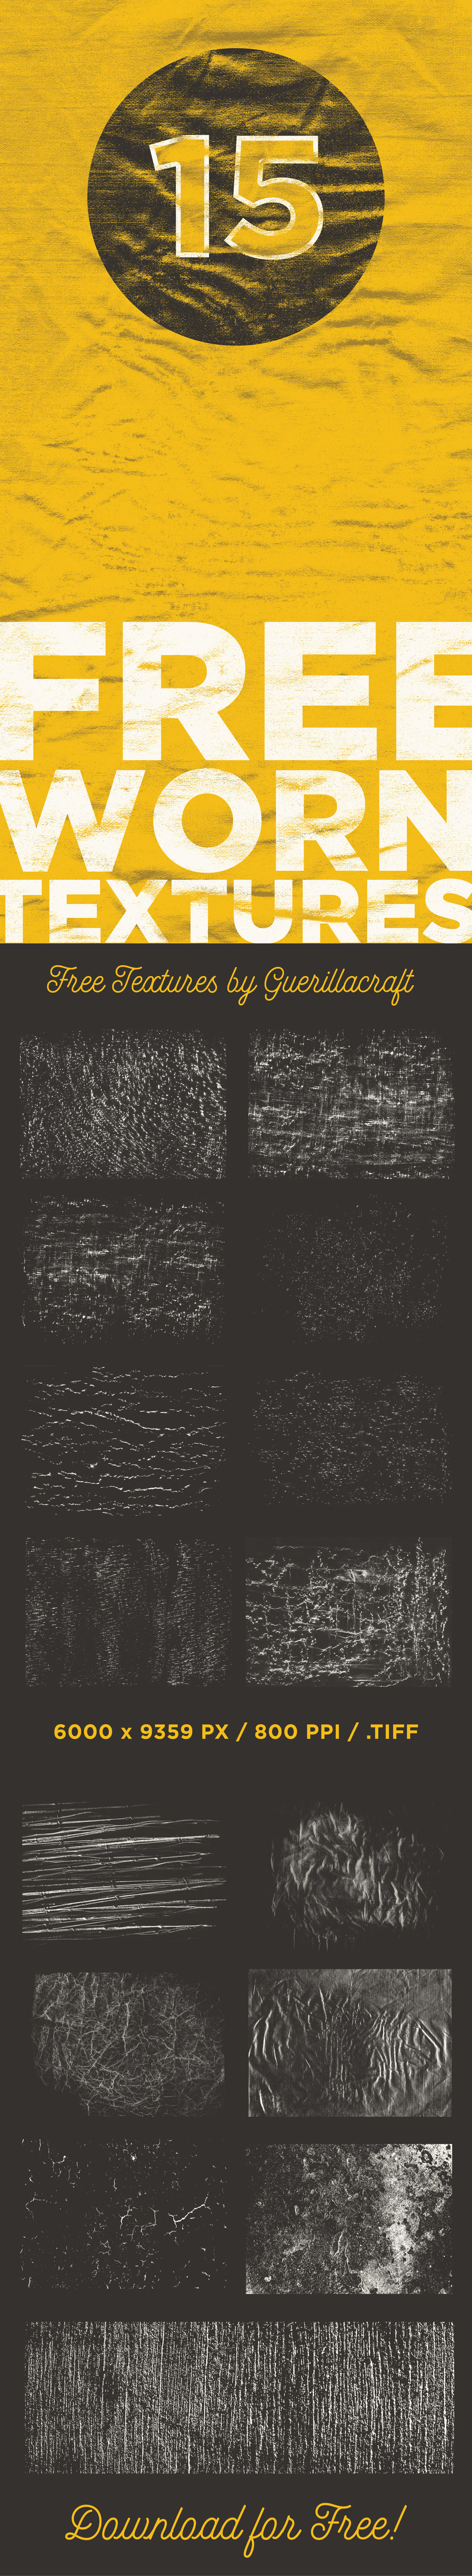 Worn-Textures-Long.jpg